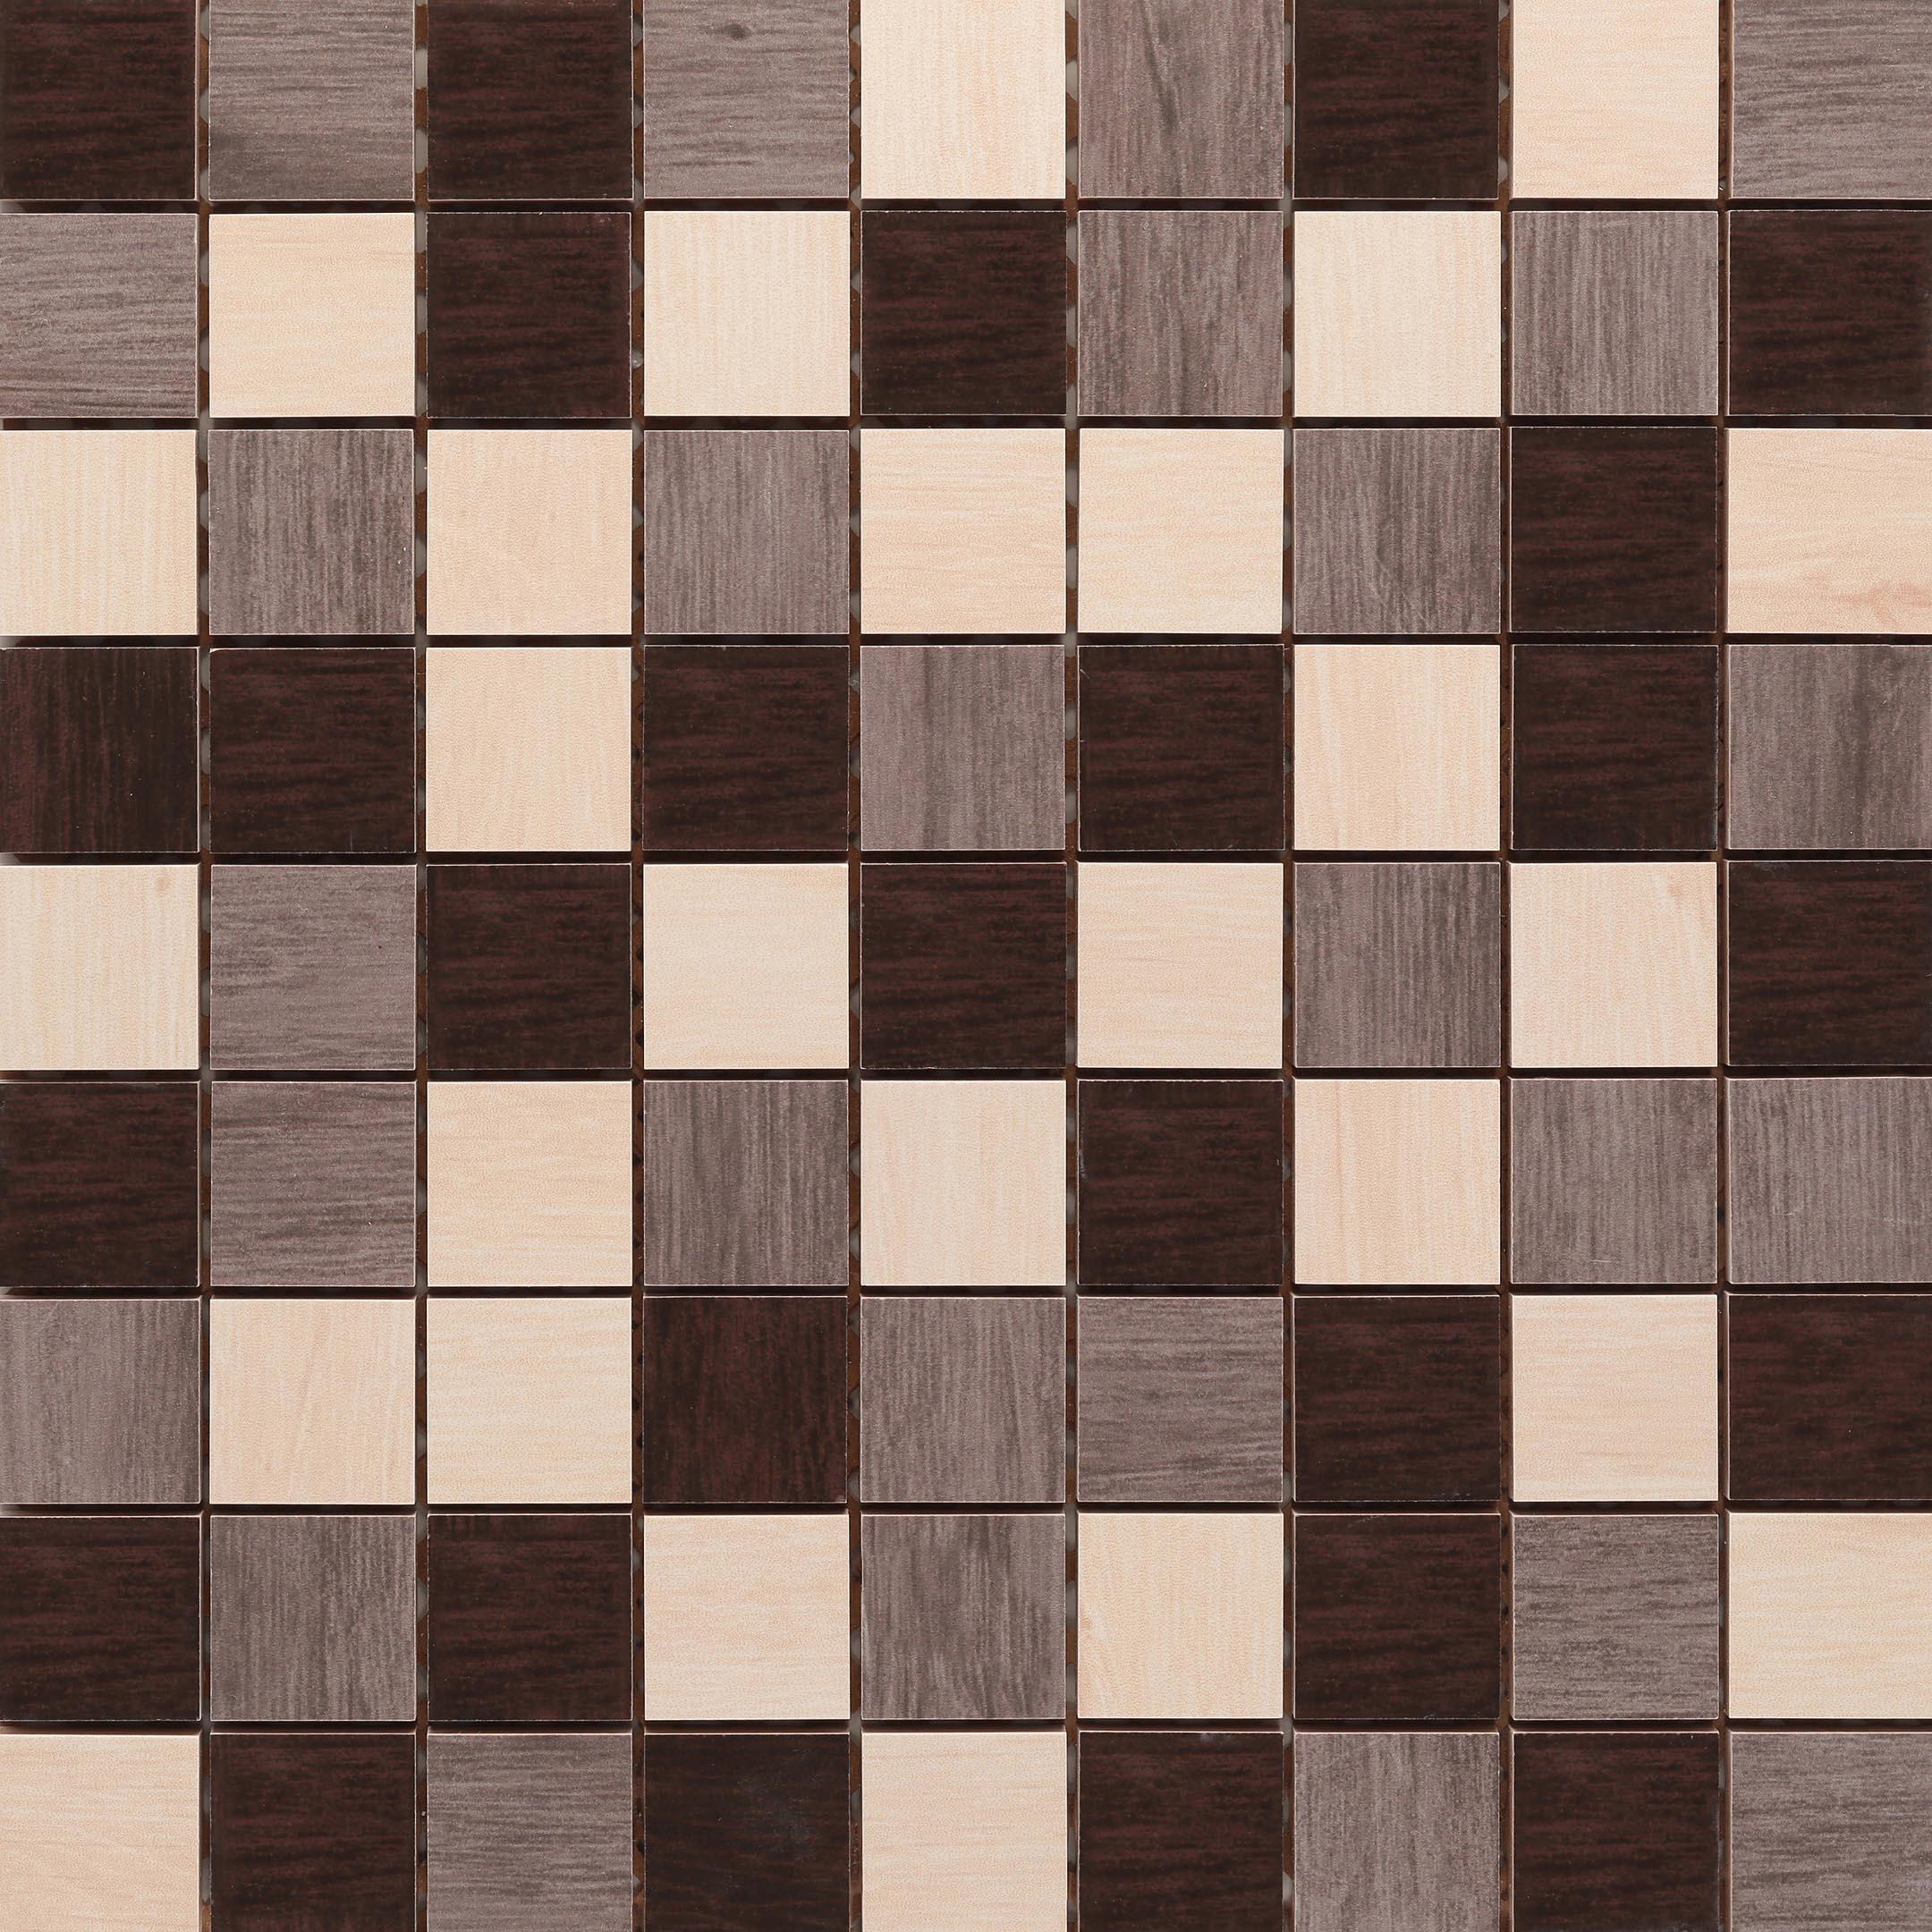 Плитка декор Cersanit Illusion многоцветная 300x300x8,5 мм